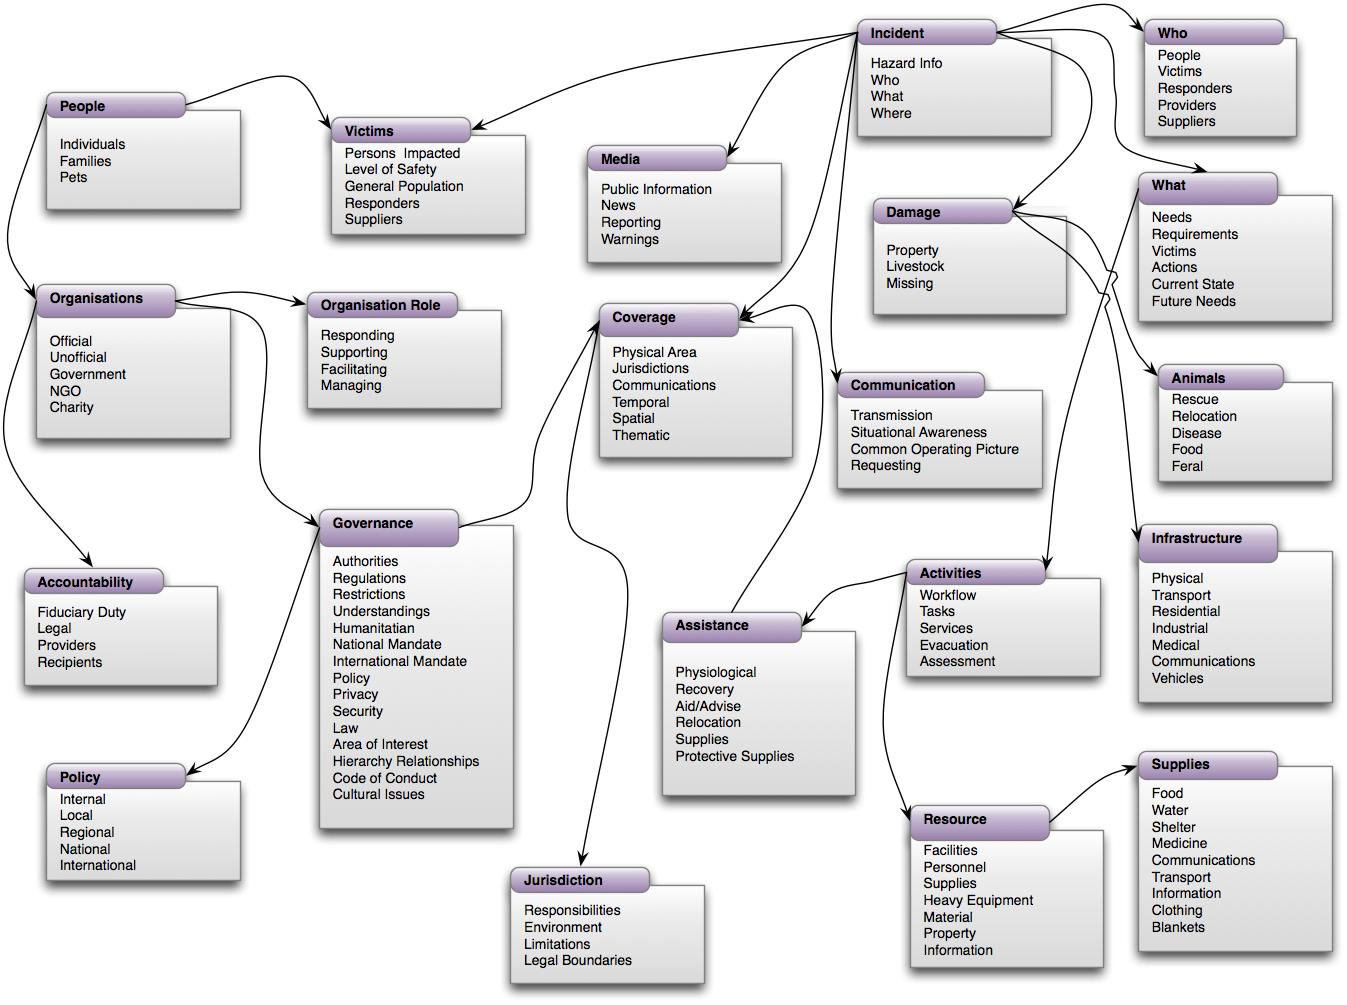 Emergency Information Interoperability Frameworks